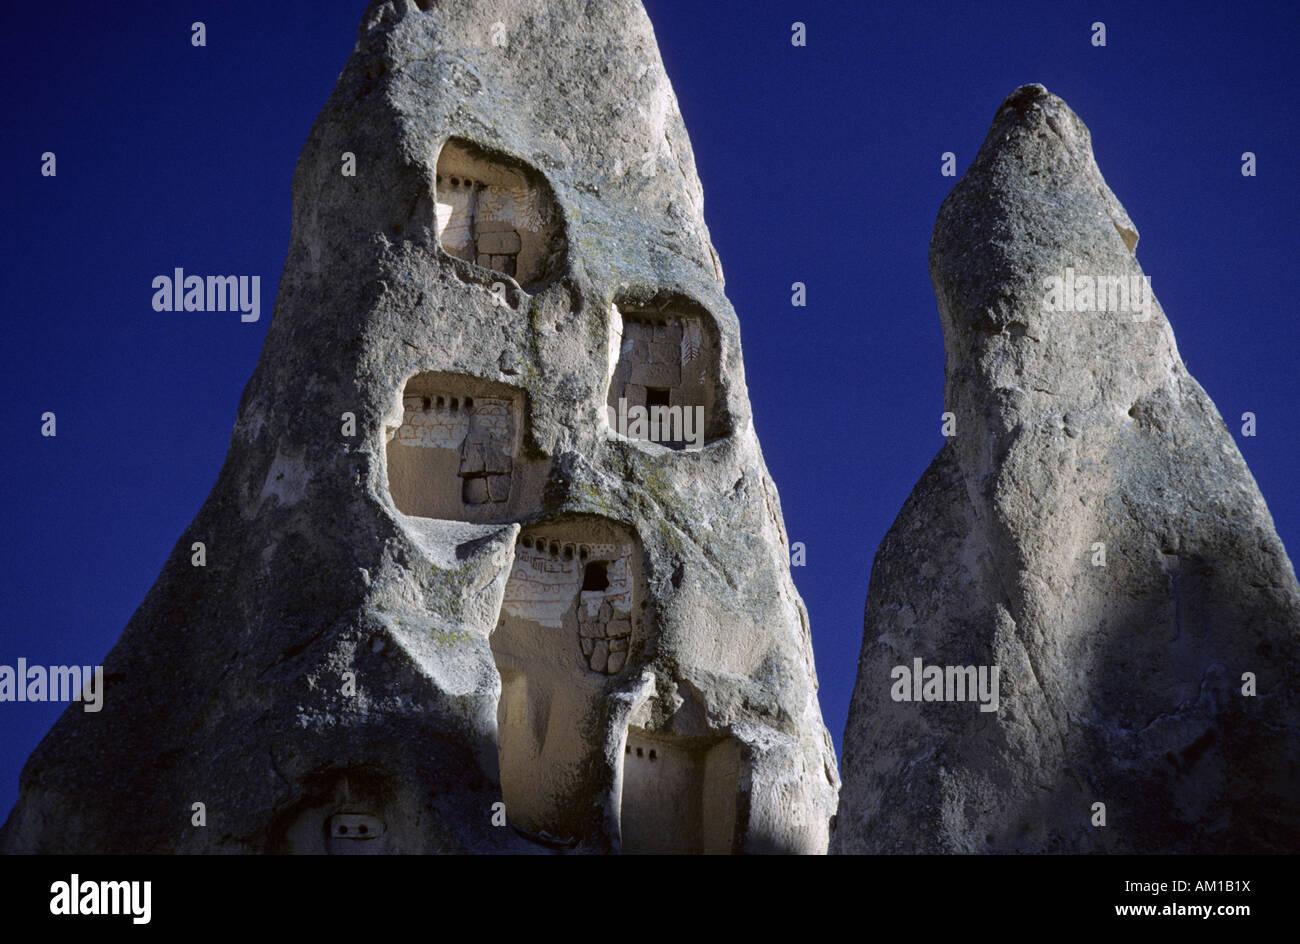 Ancient cavern flats near Goereme, Cappadokia, Turkey - Stock Image